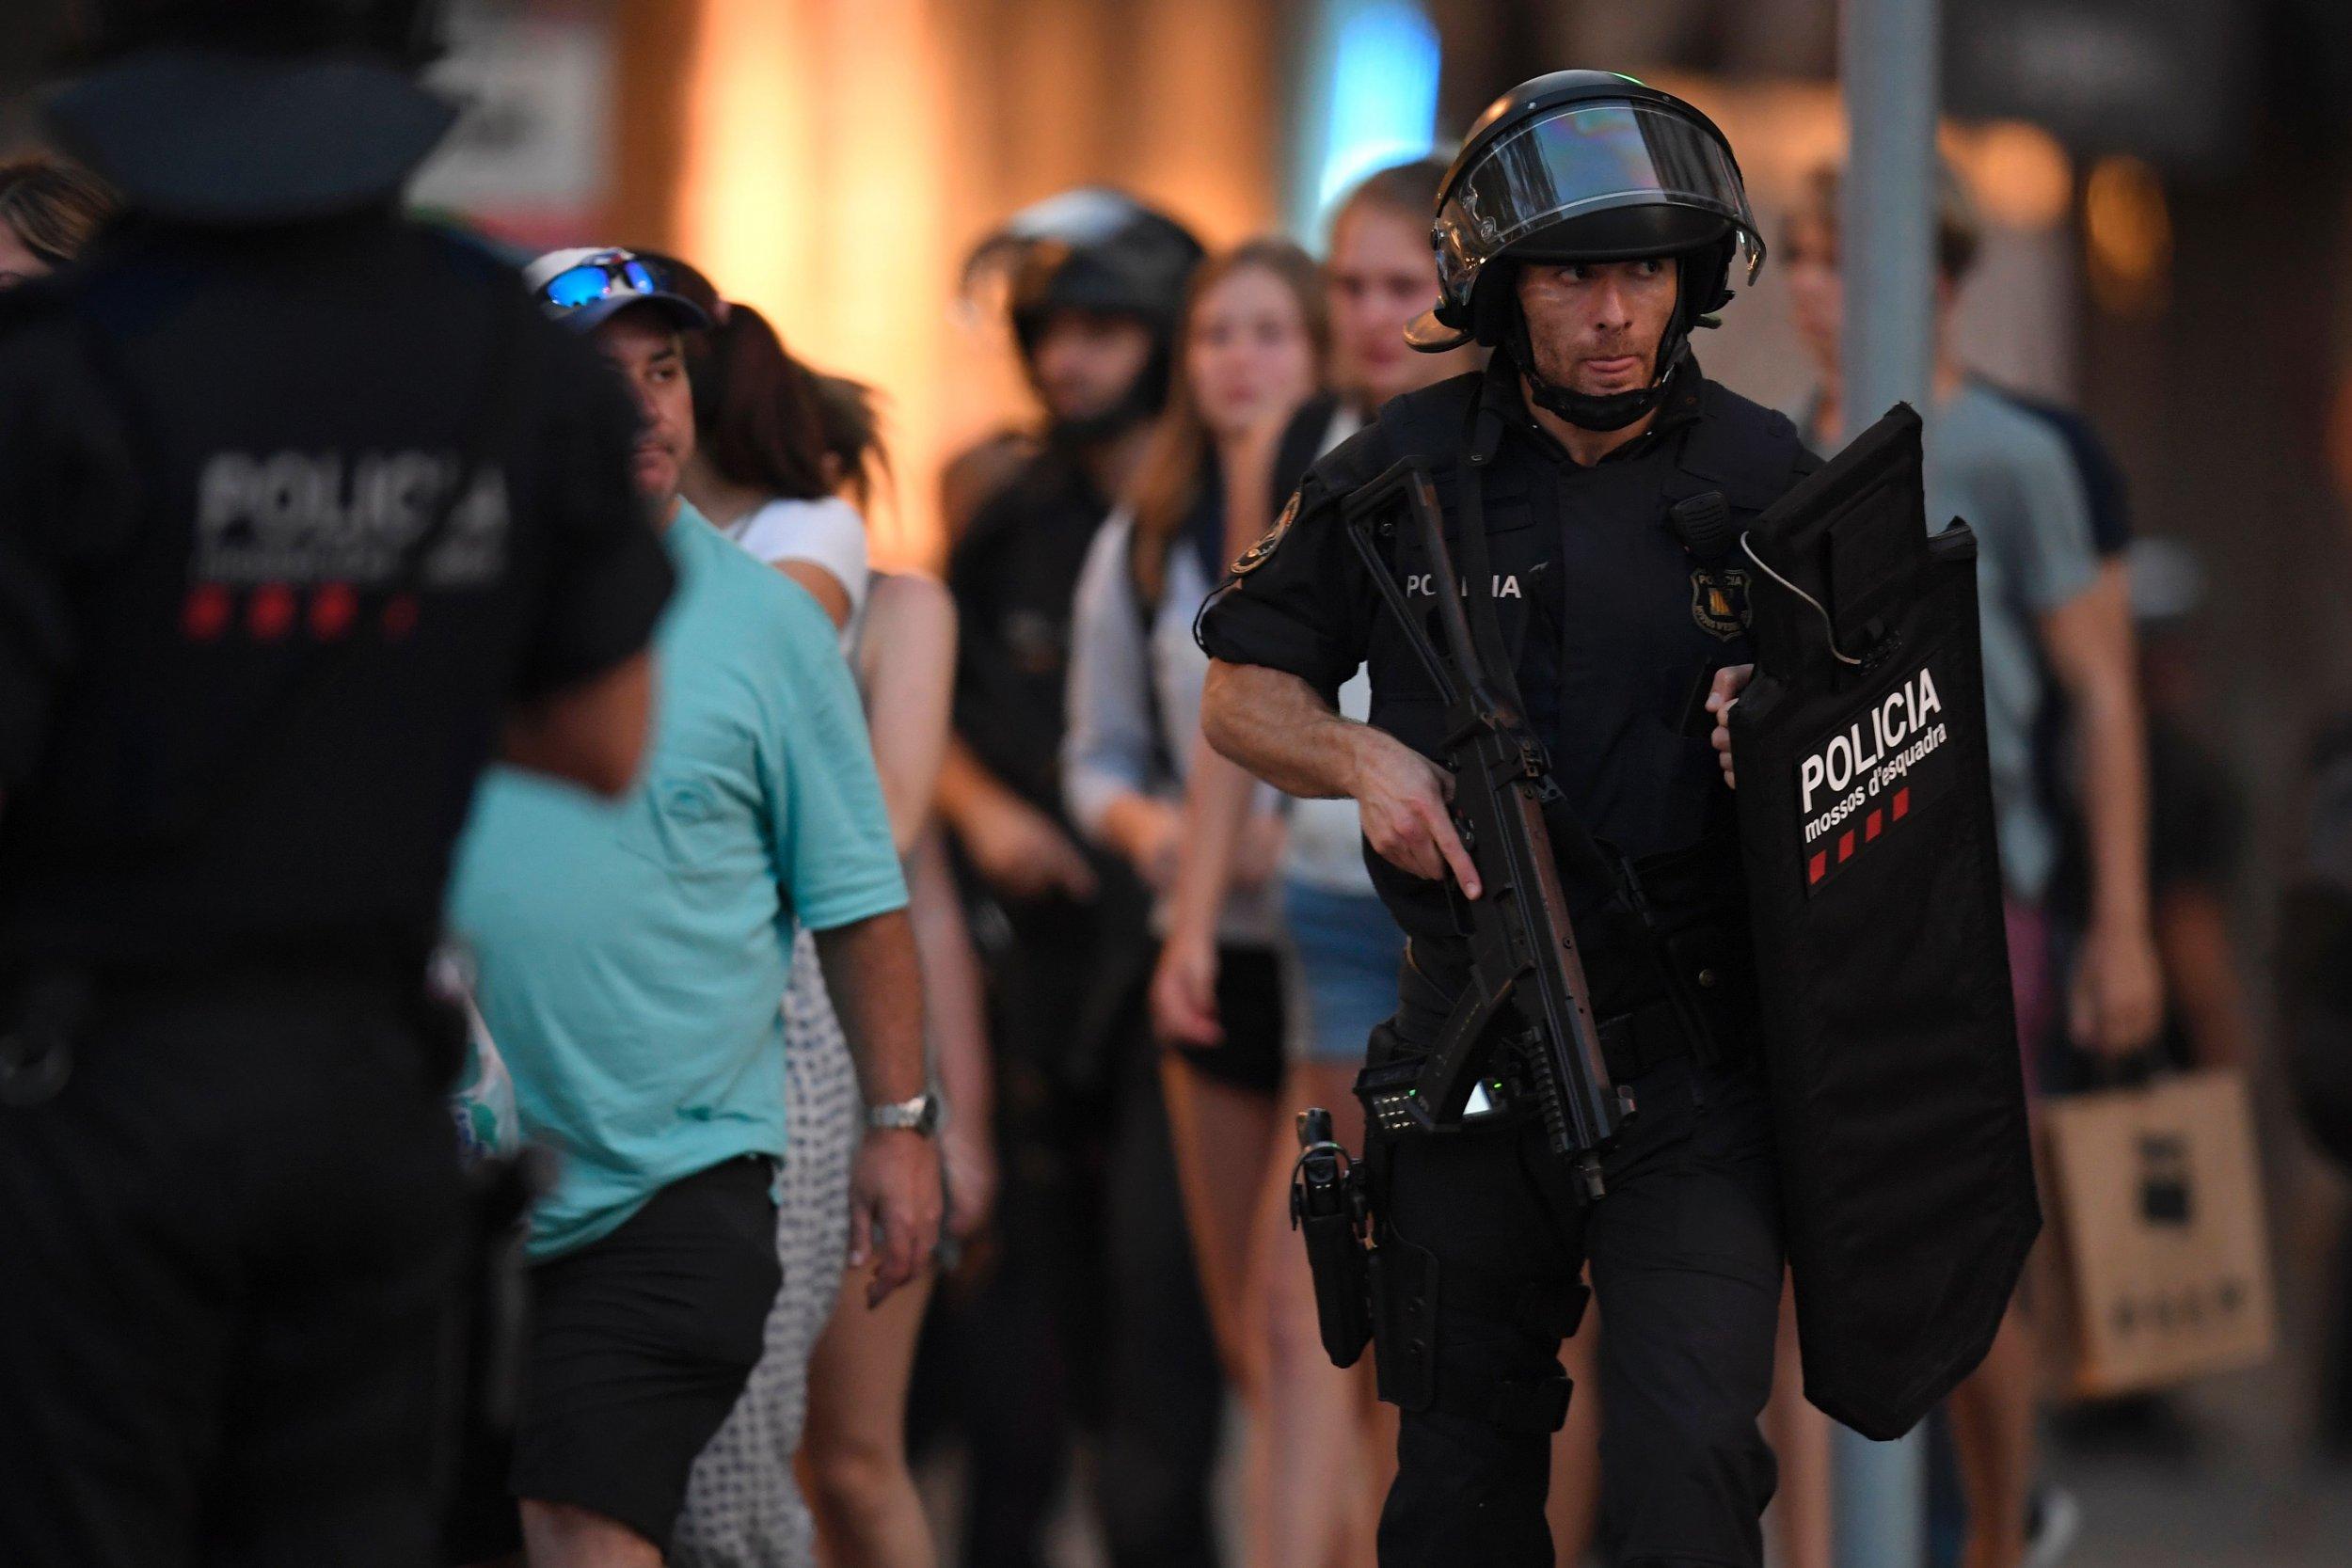 Barcelona security